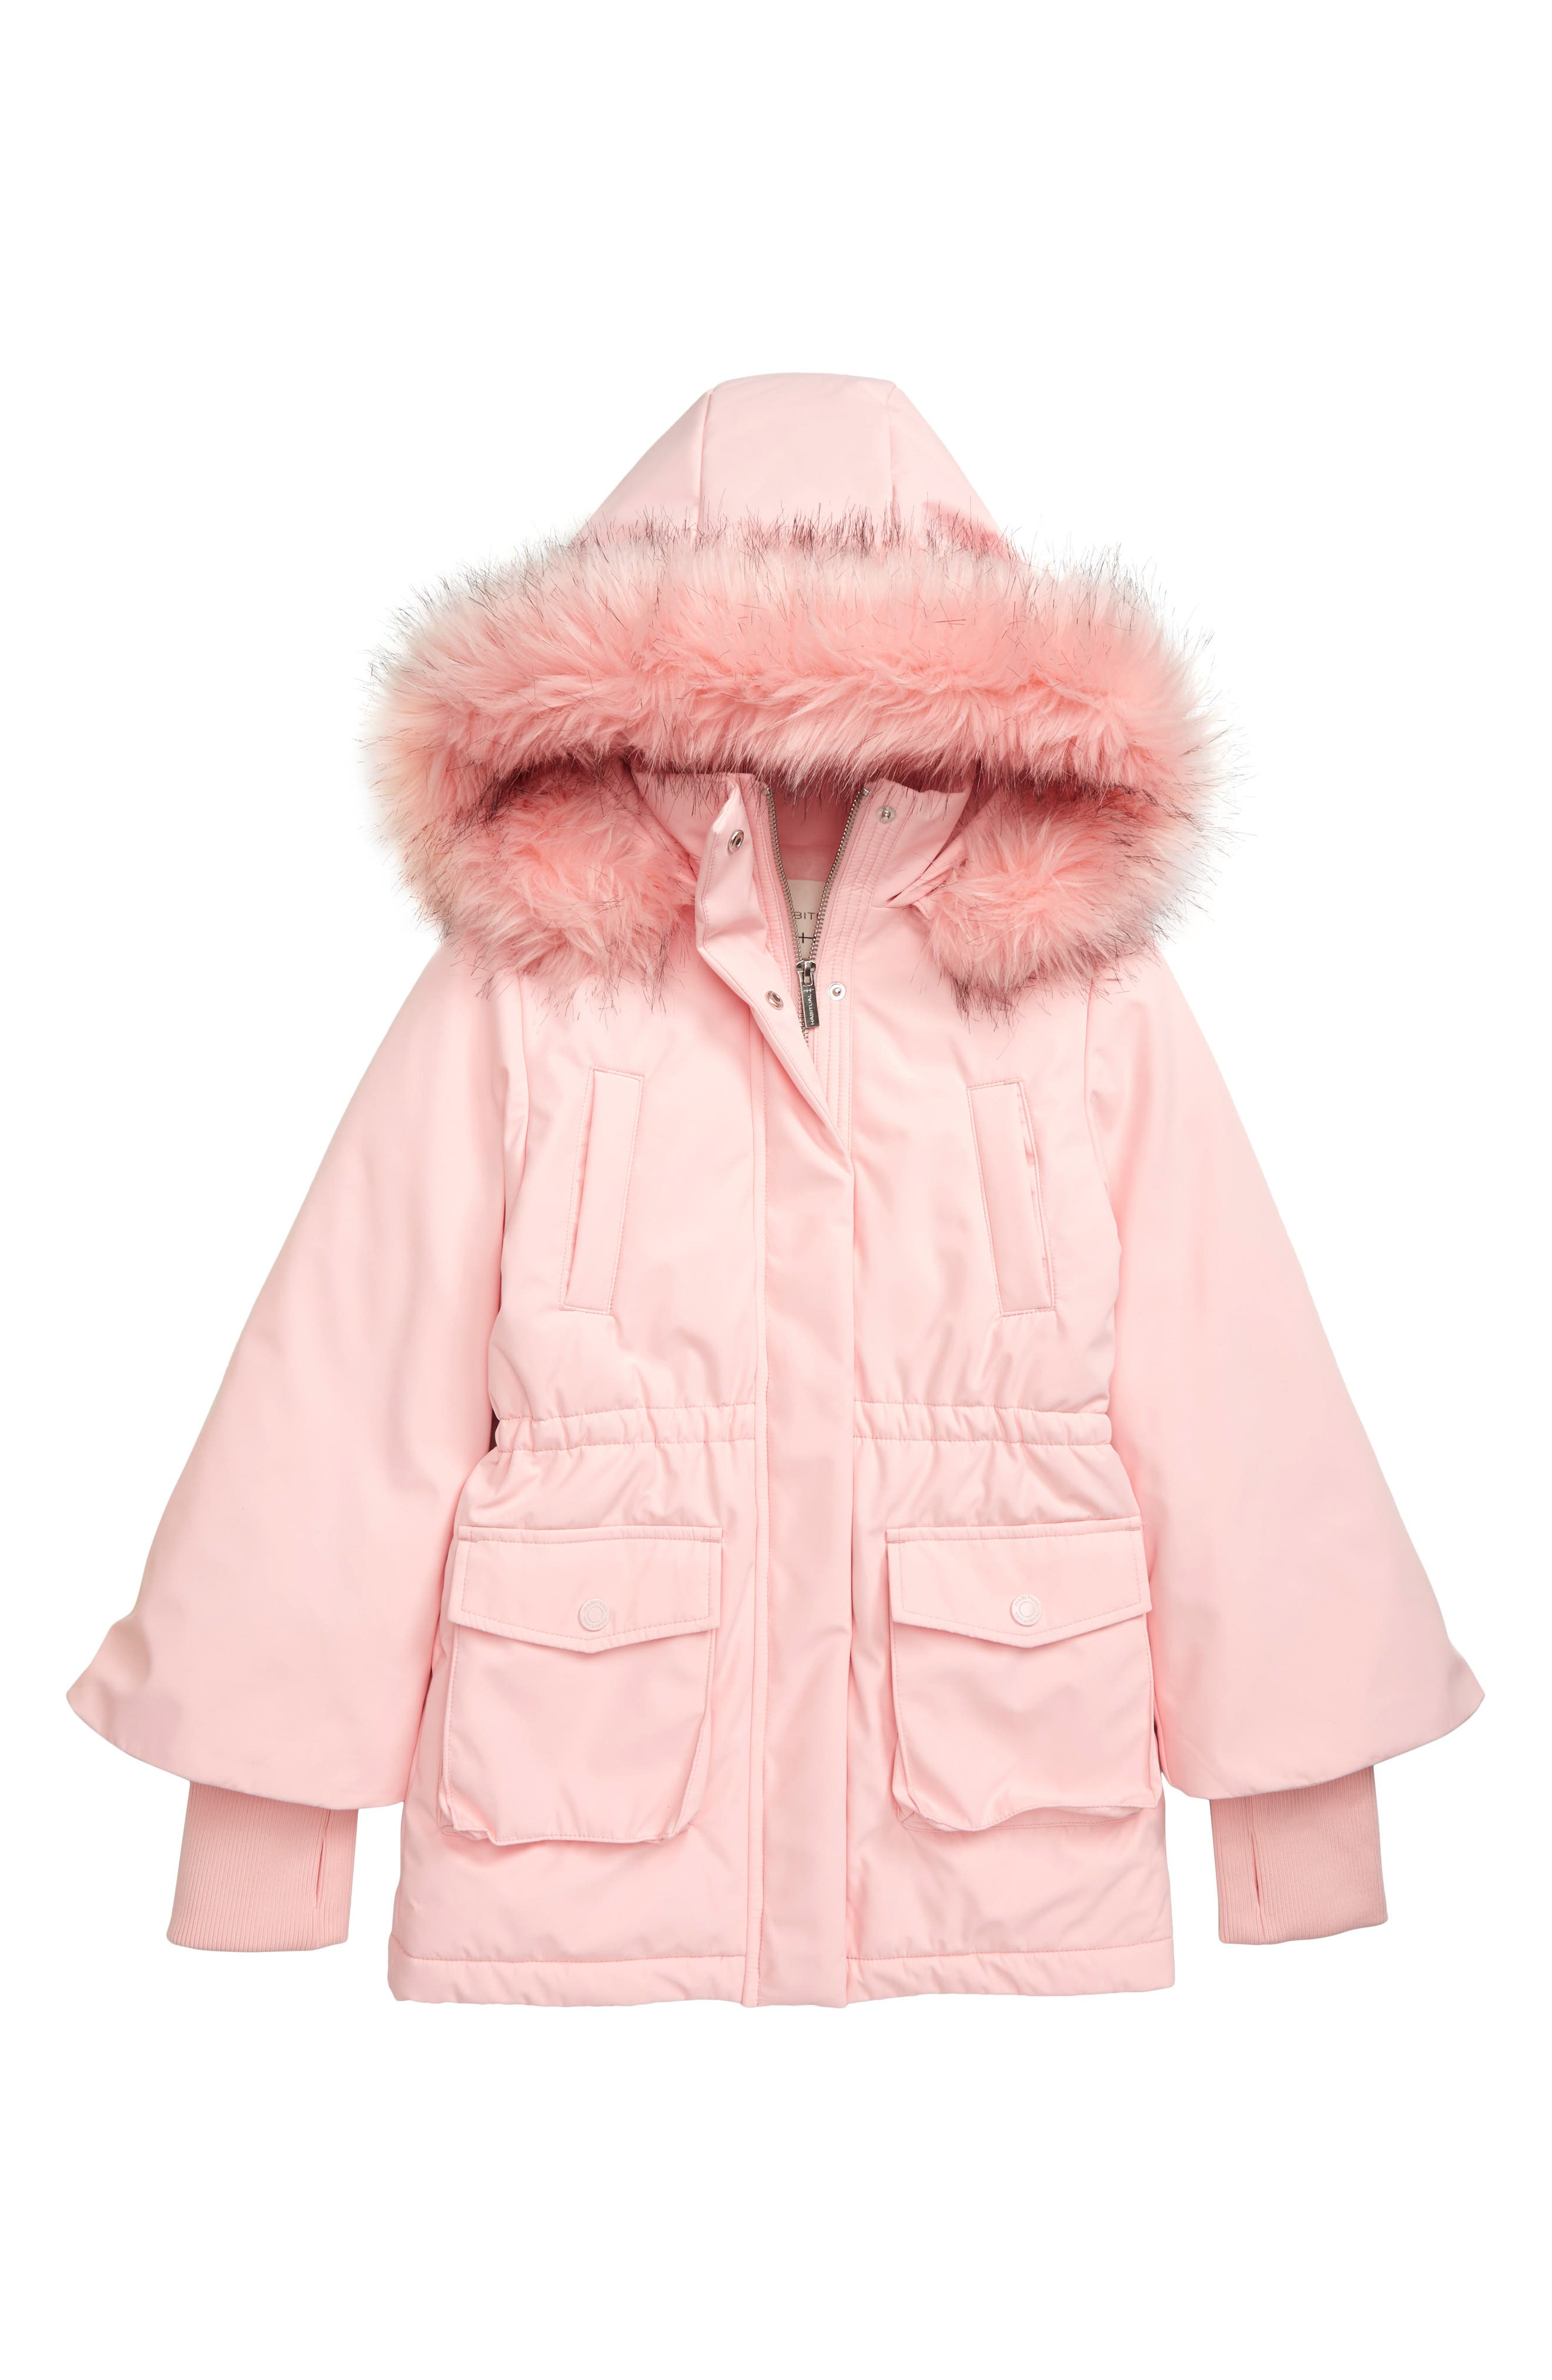 Big Kids HABITUAL girl Girls Devyn Long Faux Fur Coat